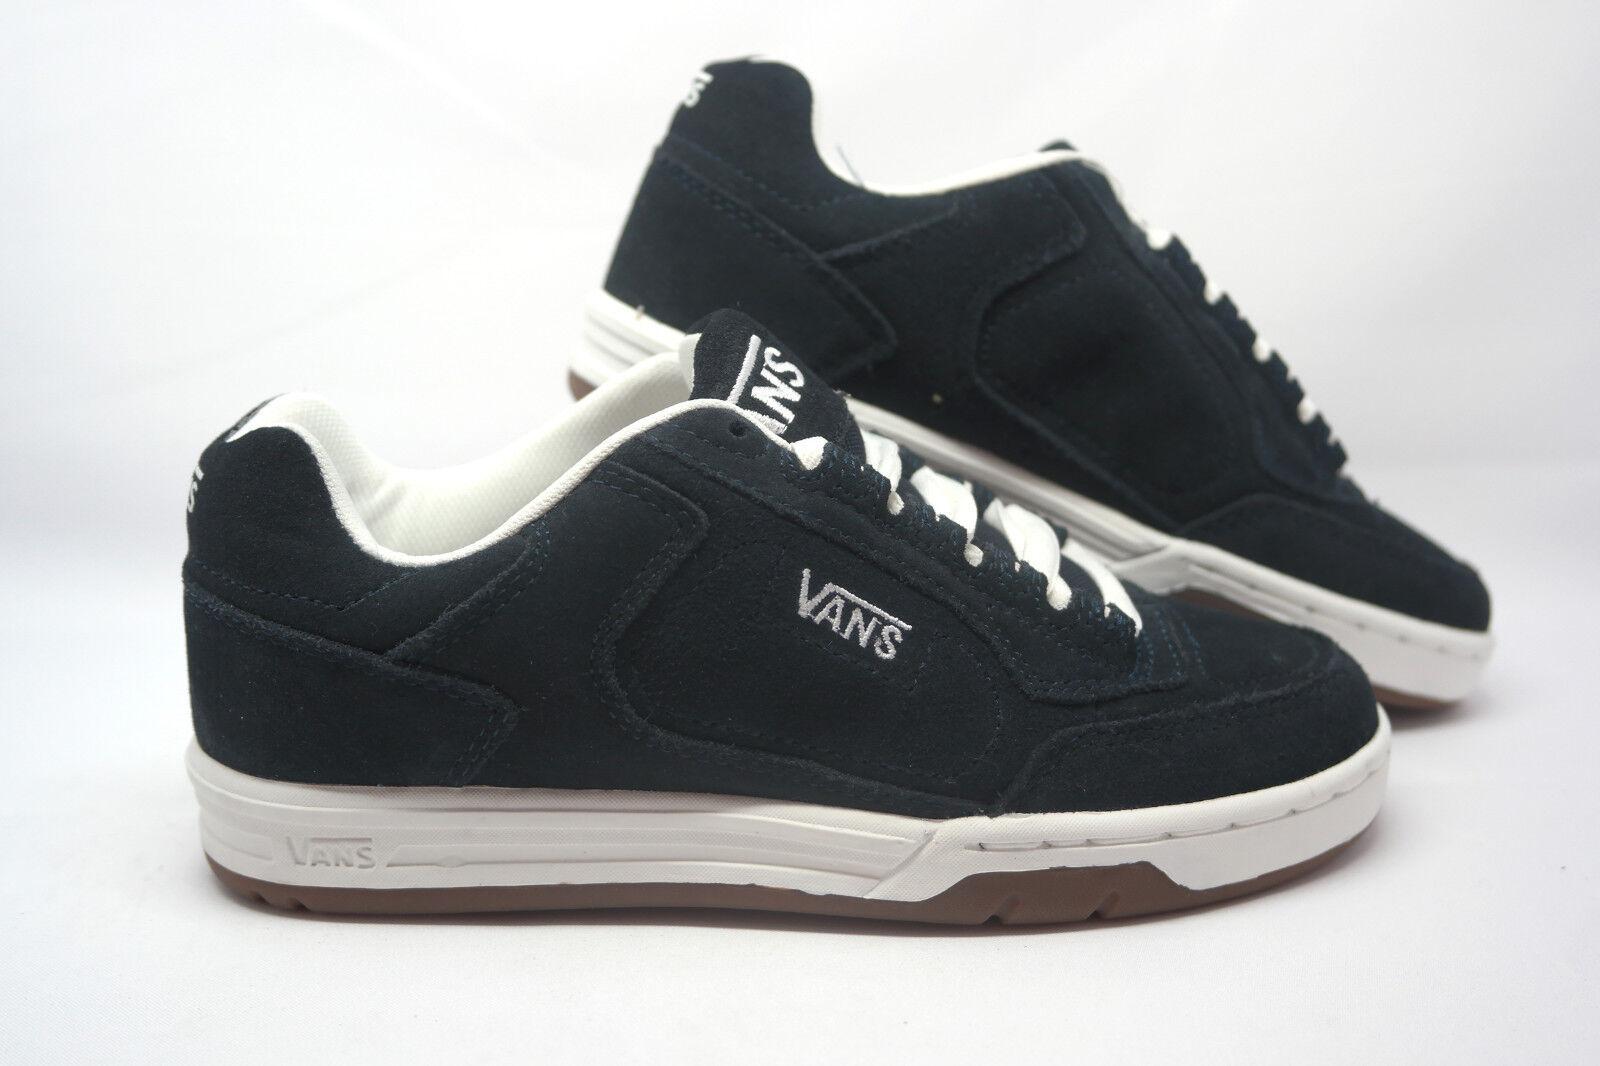 Vans Emory Navy Skateboarding  Chaussures  5217375 Youth's 4.5,5,6 femmes  6,6.5,7.5